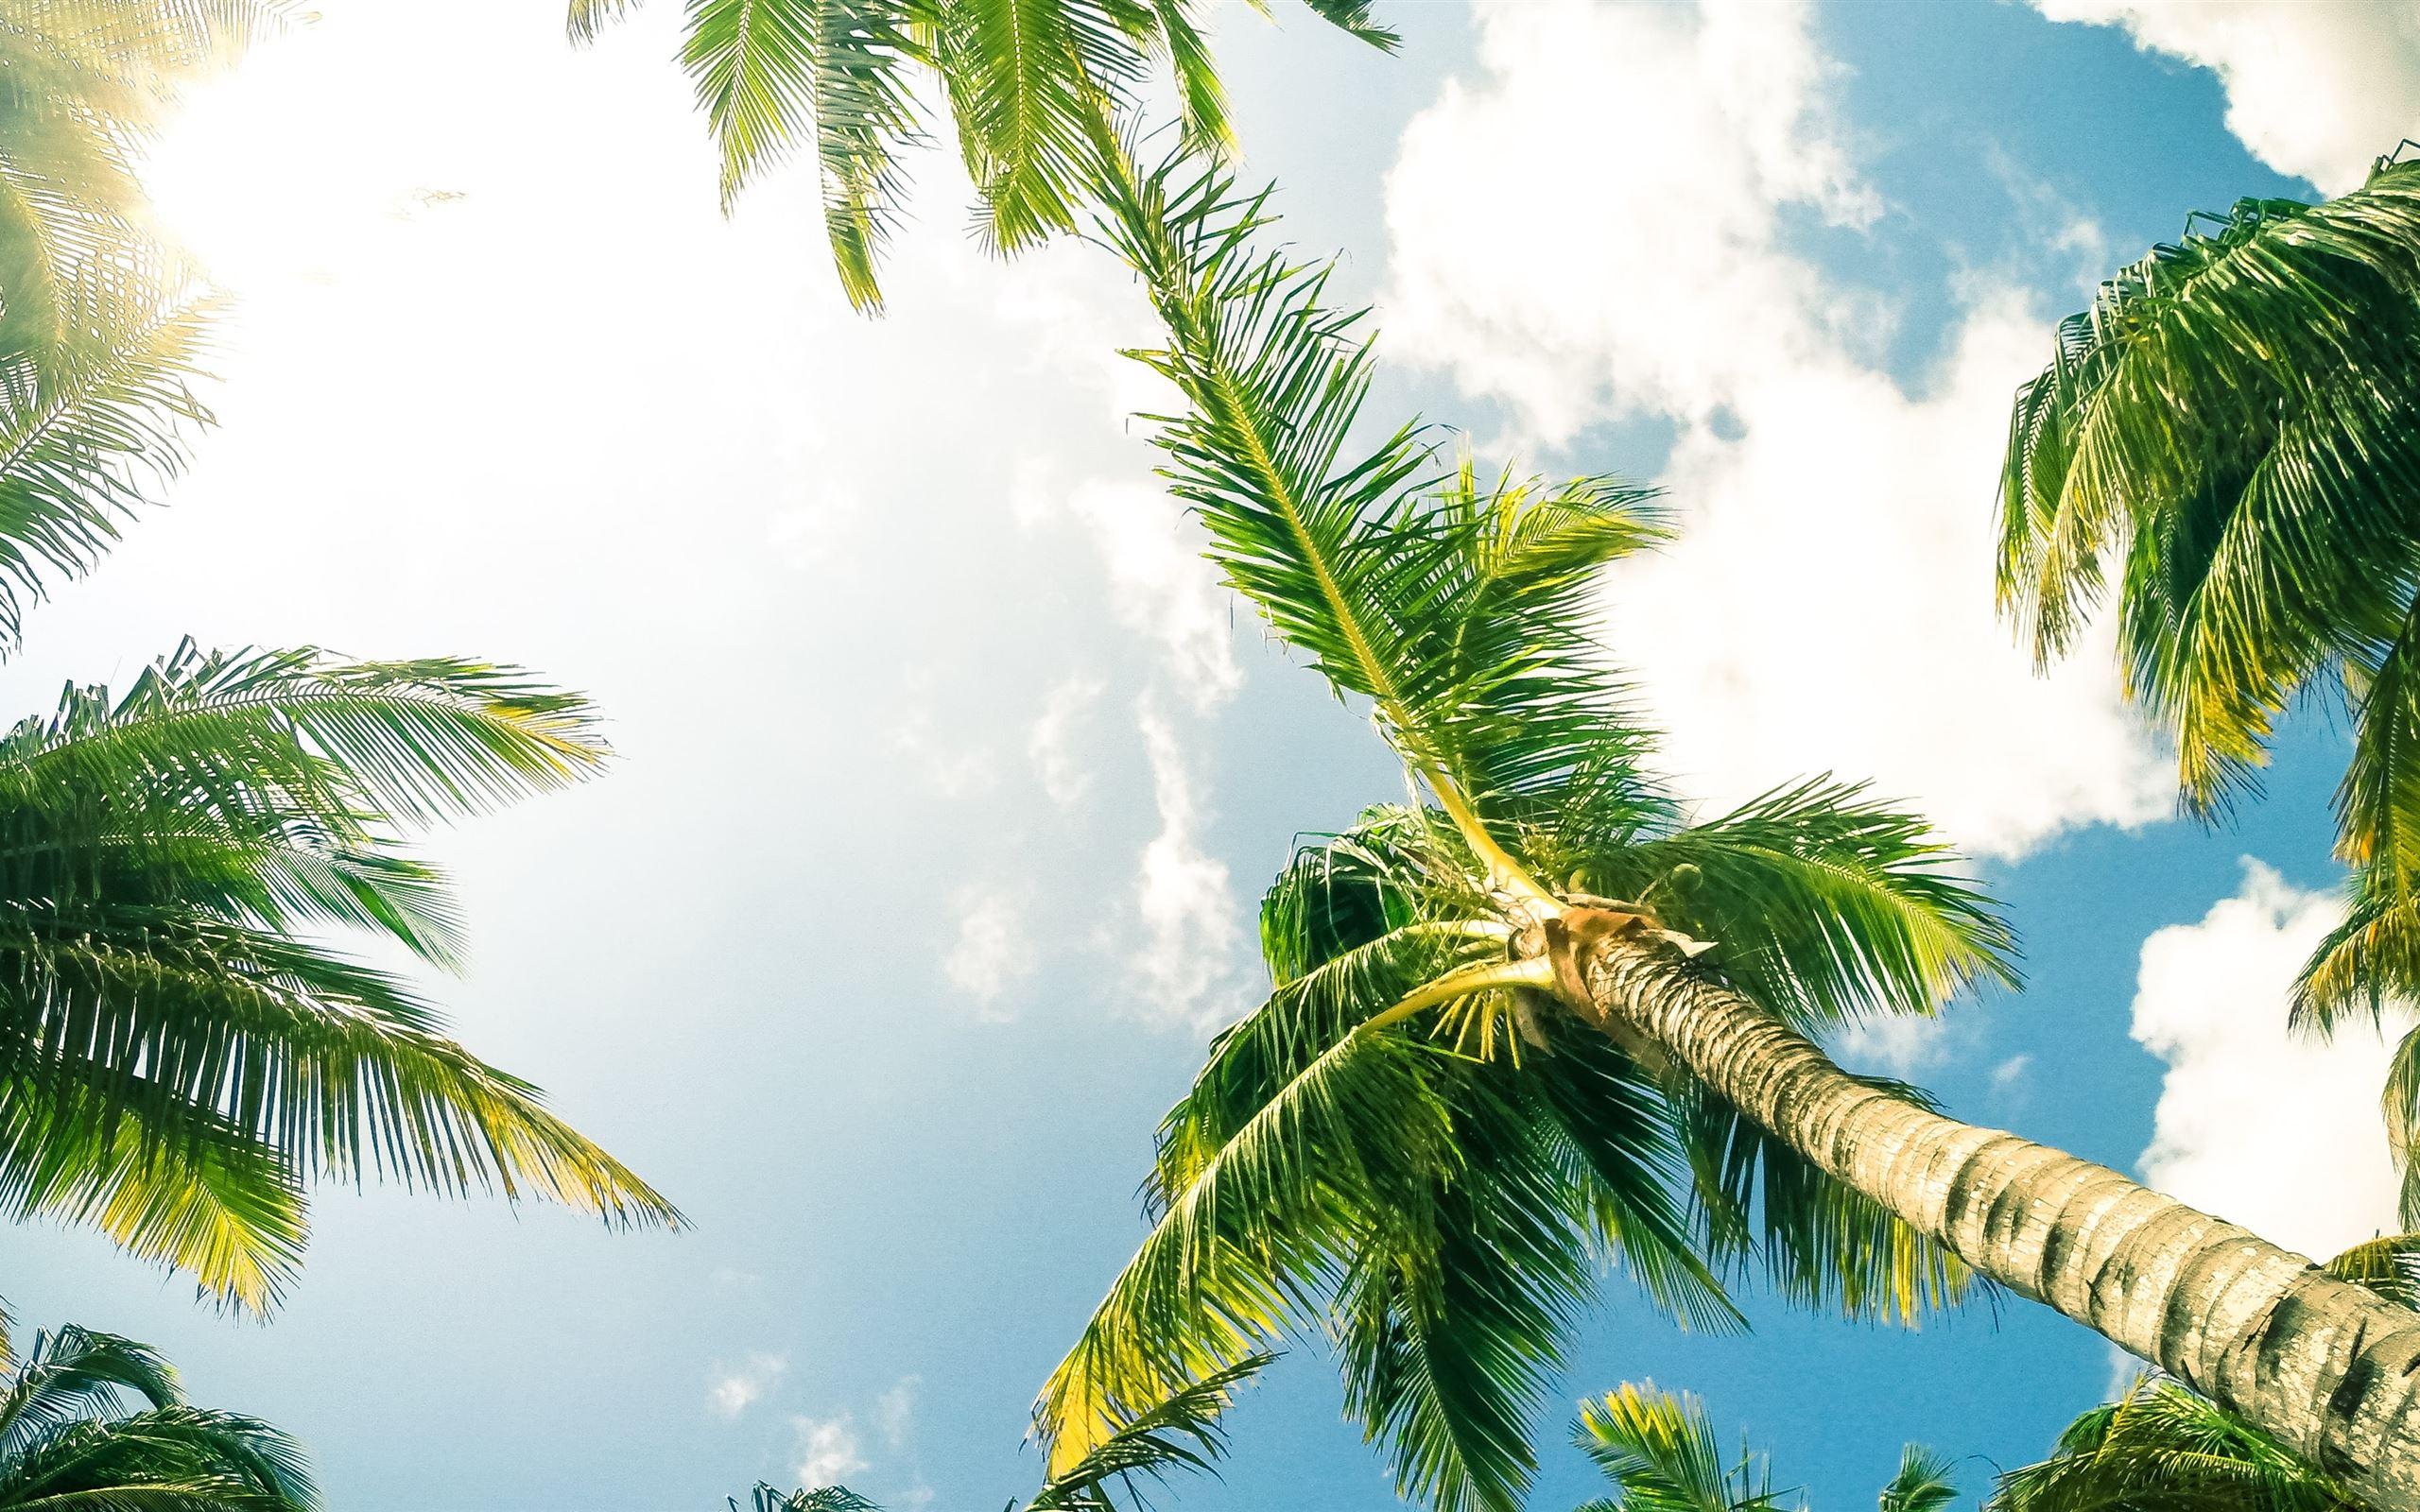 Green Coconut Palm Trees Macbook Pro Wallpaper Download Allmacwallpaper